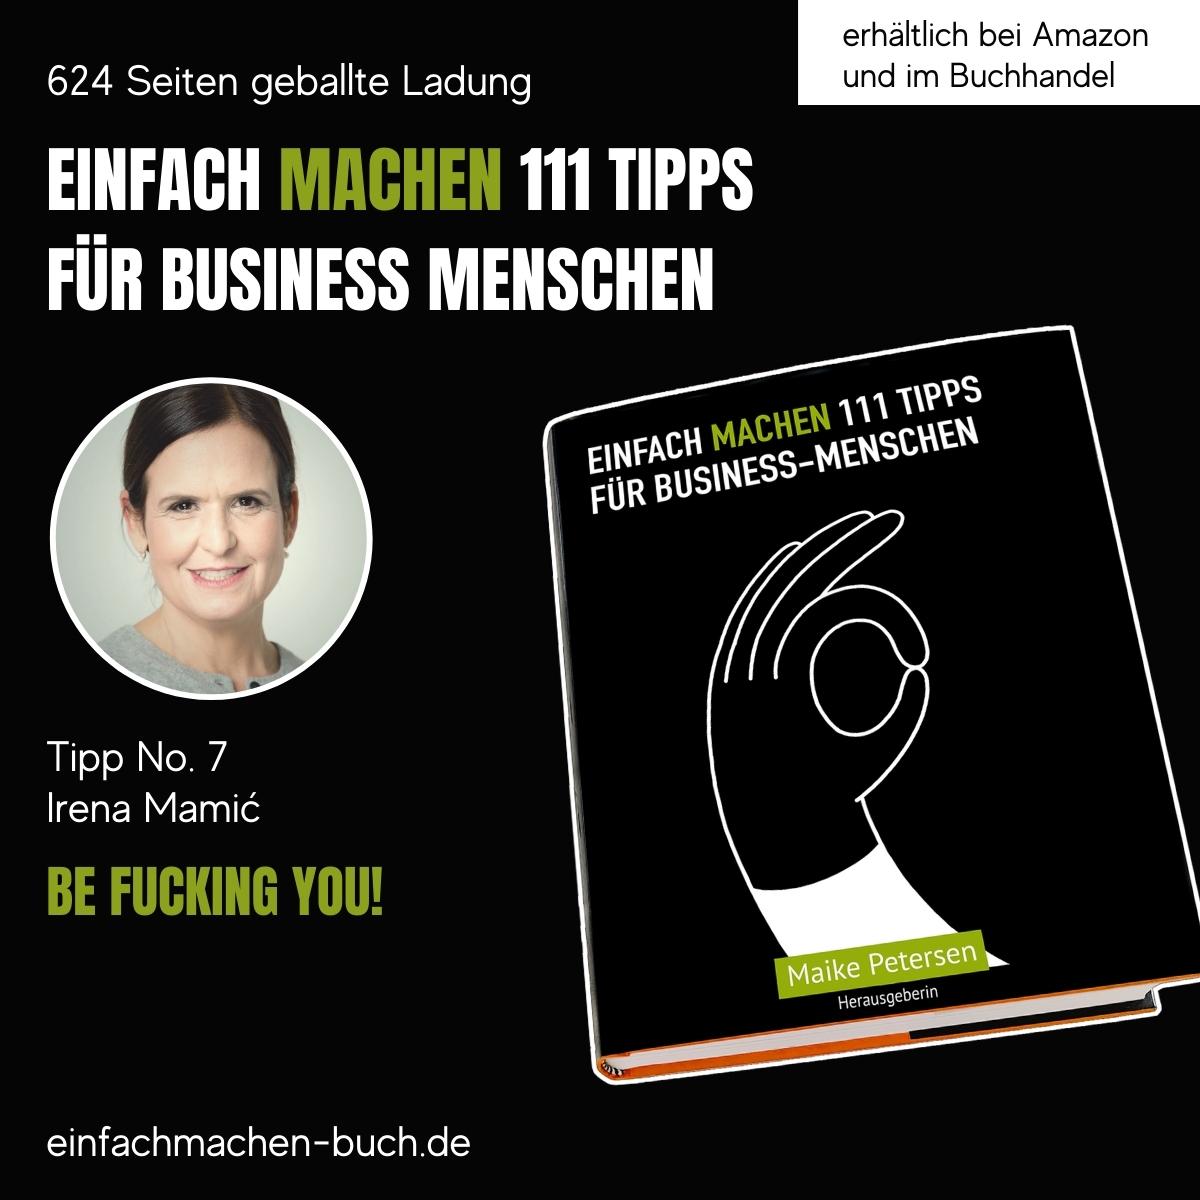 EINFACH MACHEN Tipp No. 7 Irena Mamic - Be fucking you